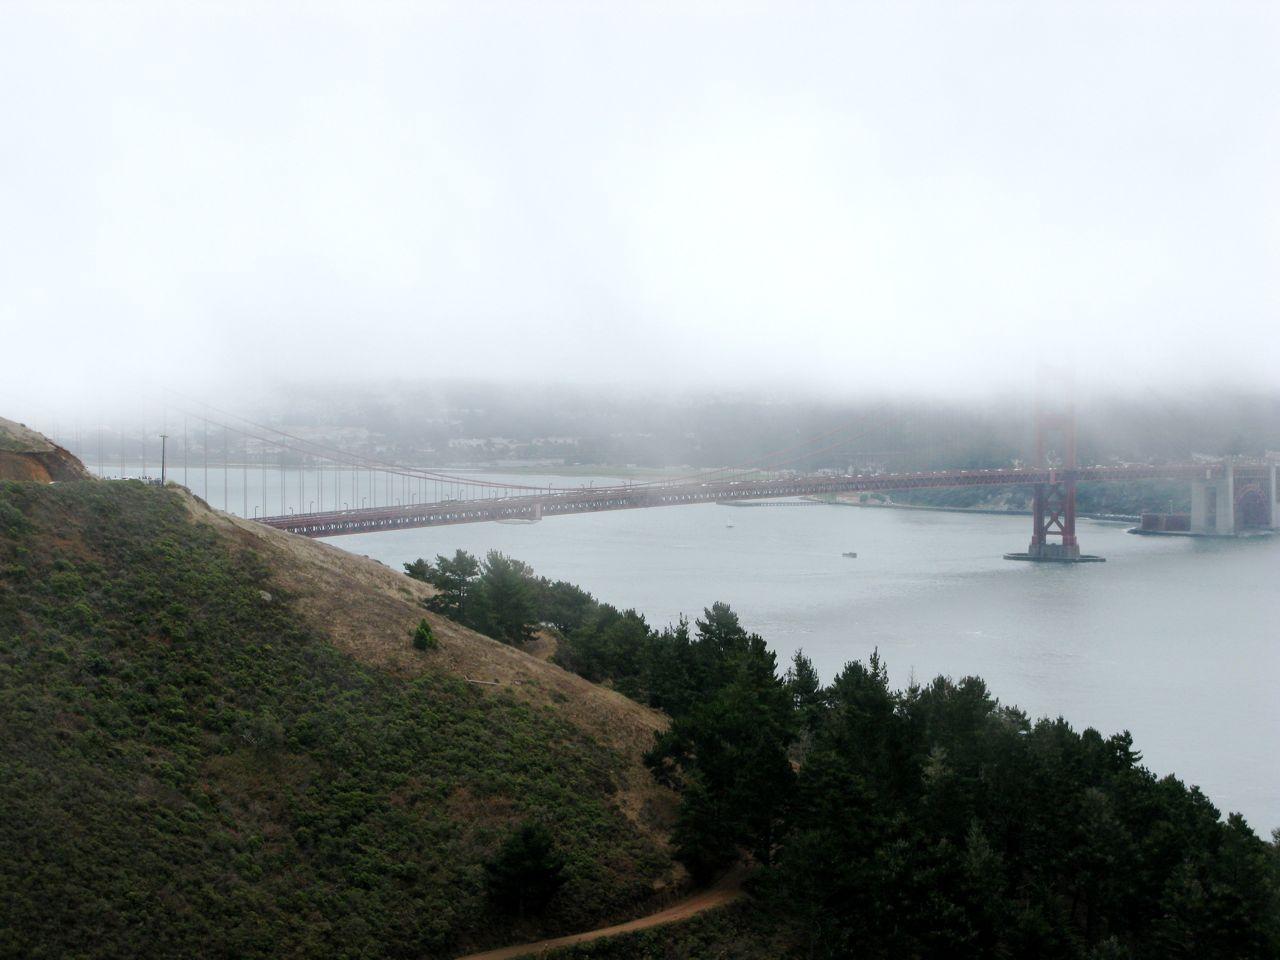 Golden Gate Bridge from across the bay